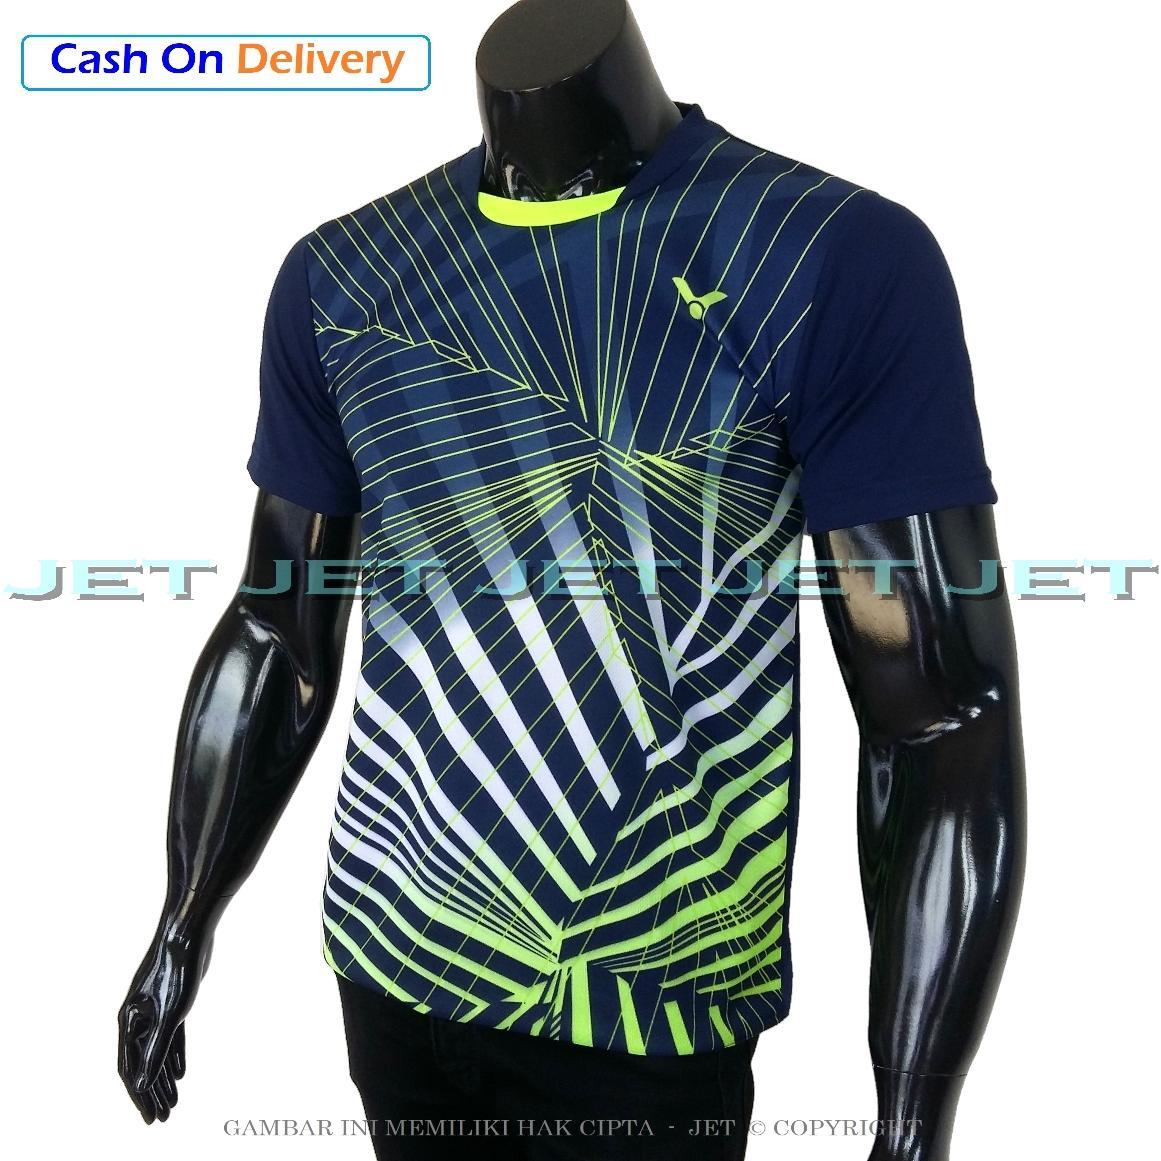 JeT Sports – Kaos Olahraga M L XL - Dri Fit Sport – Replica - Segala Aktifitas – Pria Wanita – Badminton - Baju Futsal – Sepakbola – Bola Voli – Tennis – Running – Sepeda – Training Dan Lainnya – Sporty – Gym – Fitness Fitnes Indonesia VCR